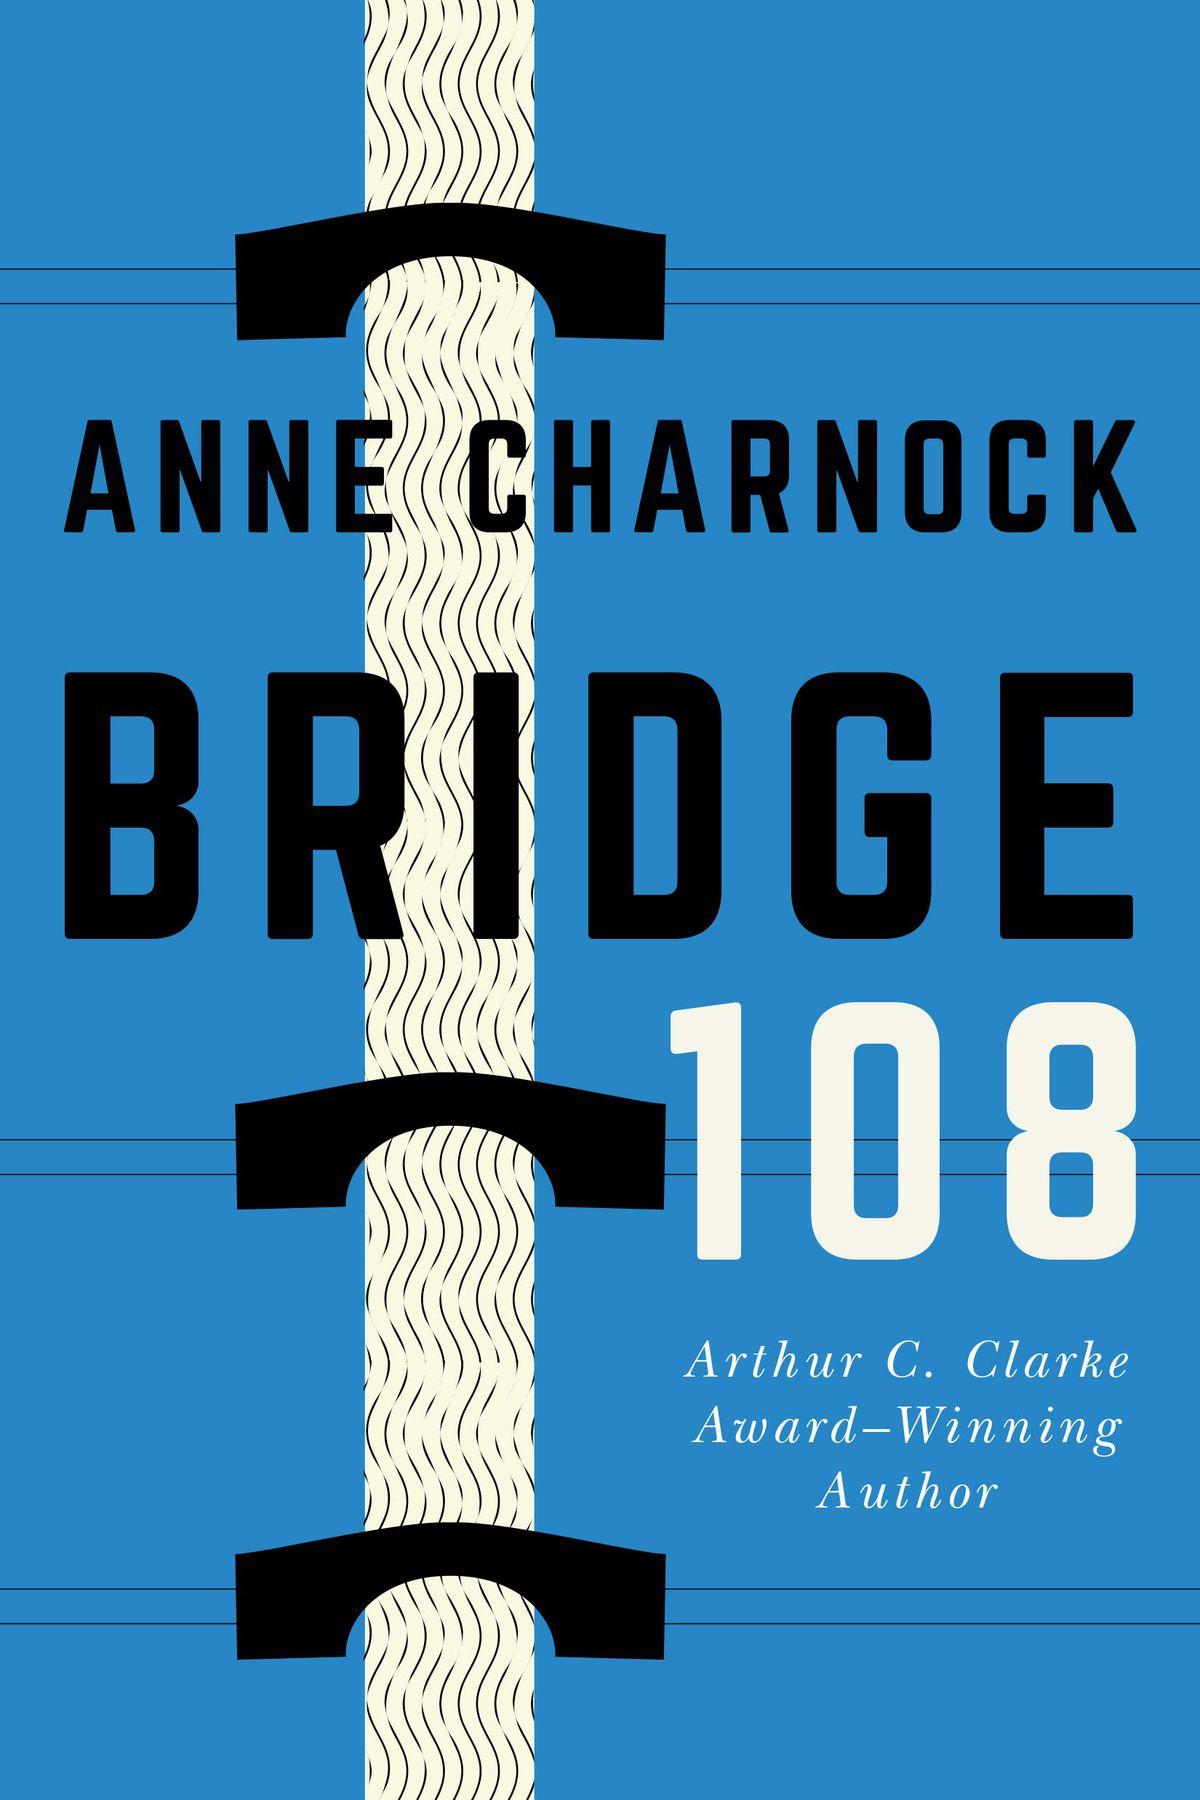 bridge on the bridge of Bridge 108 by Anne Charnock